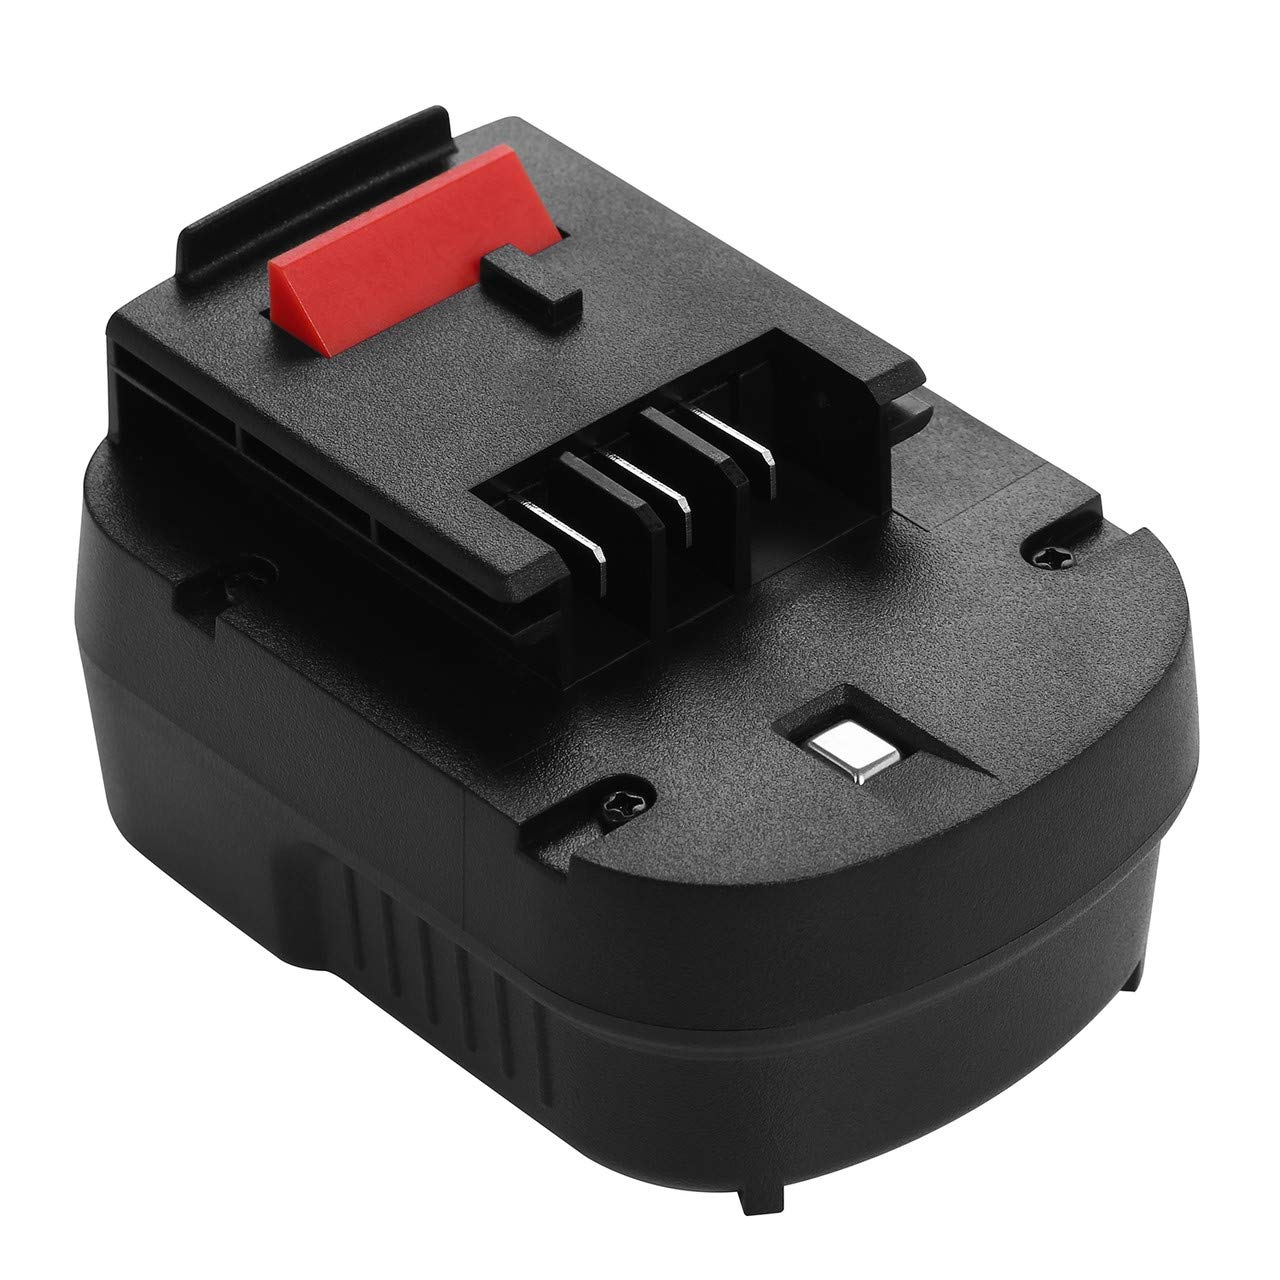 Upgraded Powerextra 12V 3000mAh NI-MH Replacement Battery Compatible with Black & Decker A1712 FS120B FSB12 HPB12 A12 A12-XJ A12EX FS120B FSB12